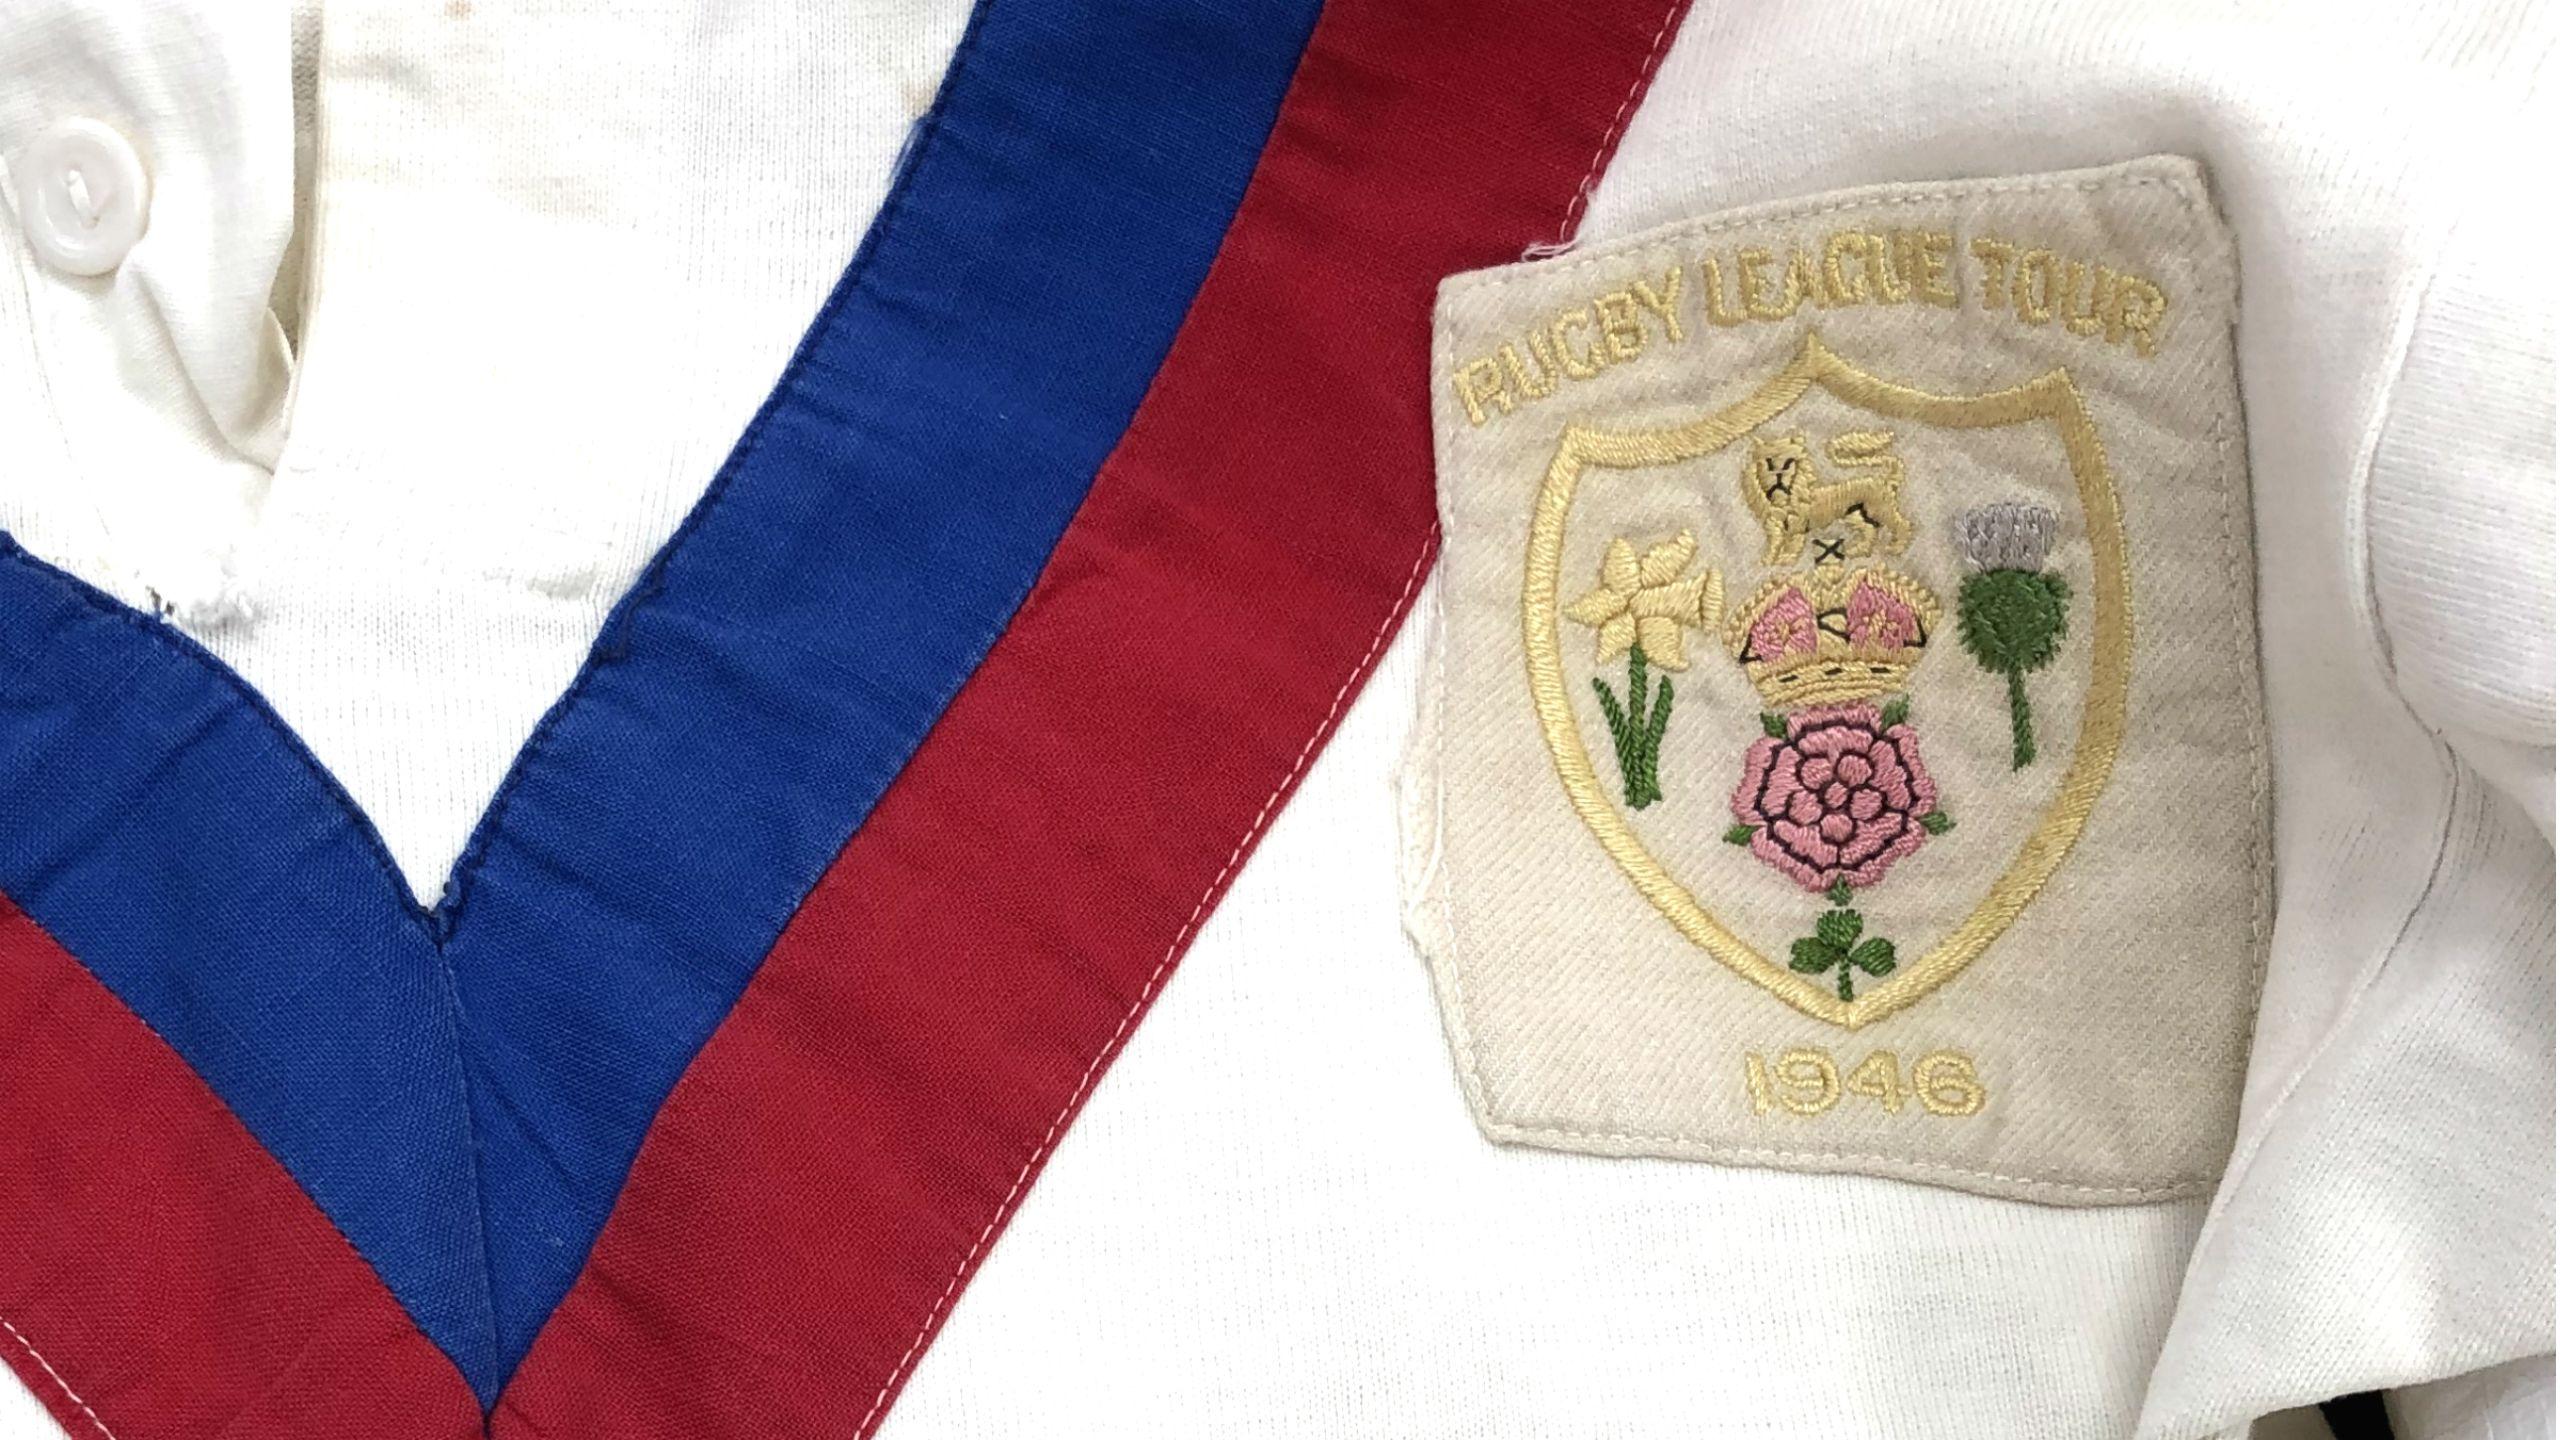 Great Britain 1946 shirt